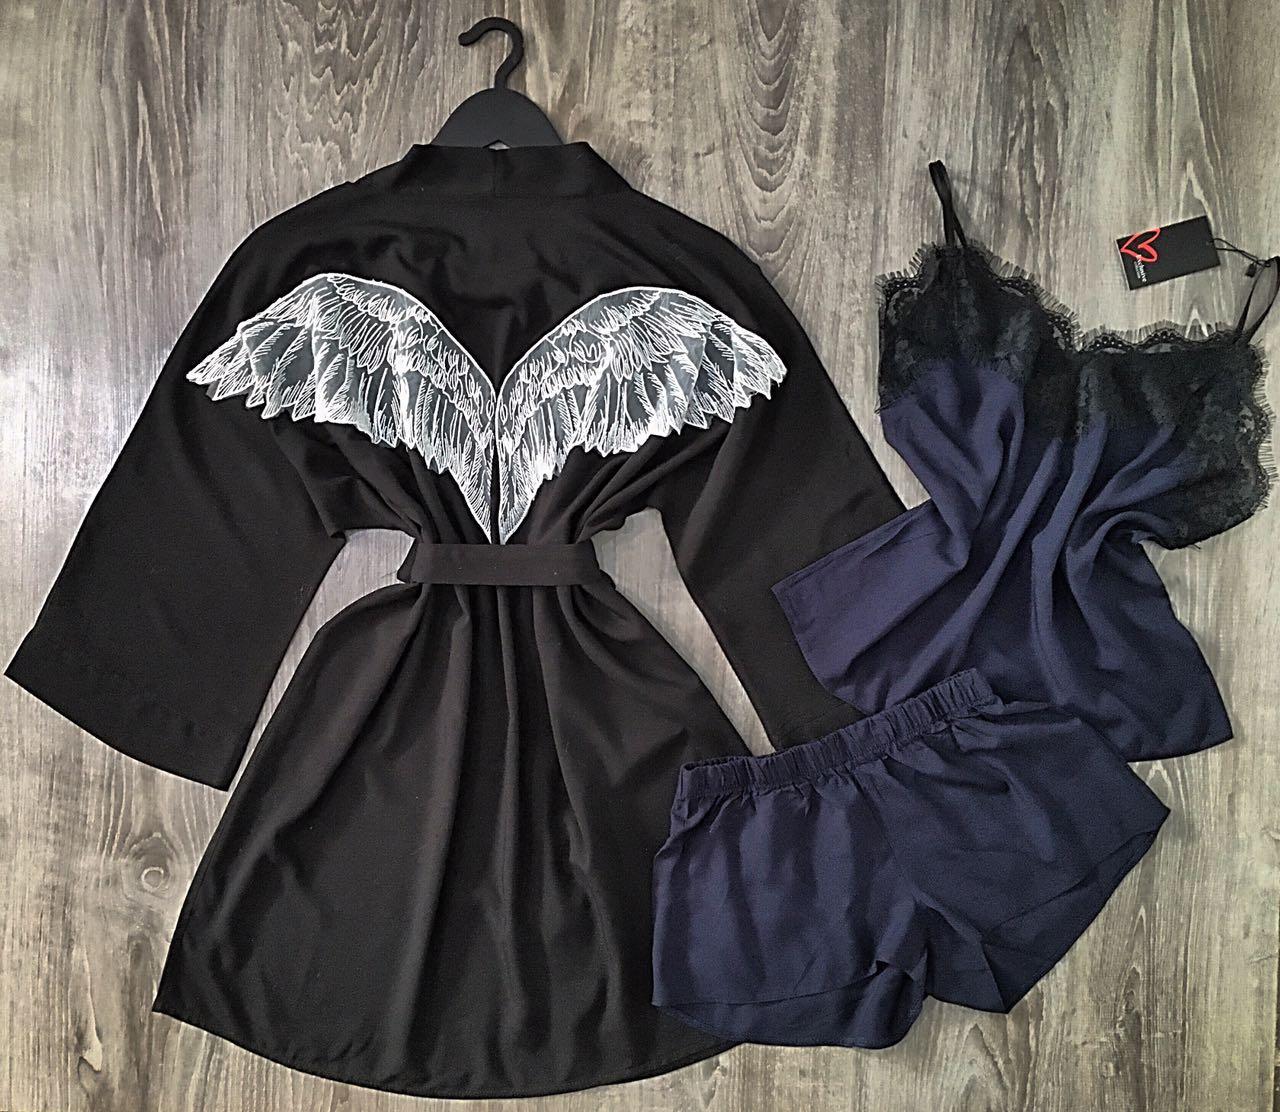 Черный халат крылья ангела+пижама, комплект .